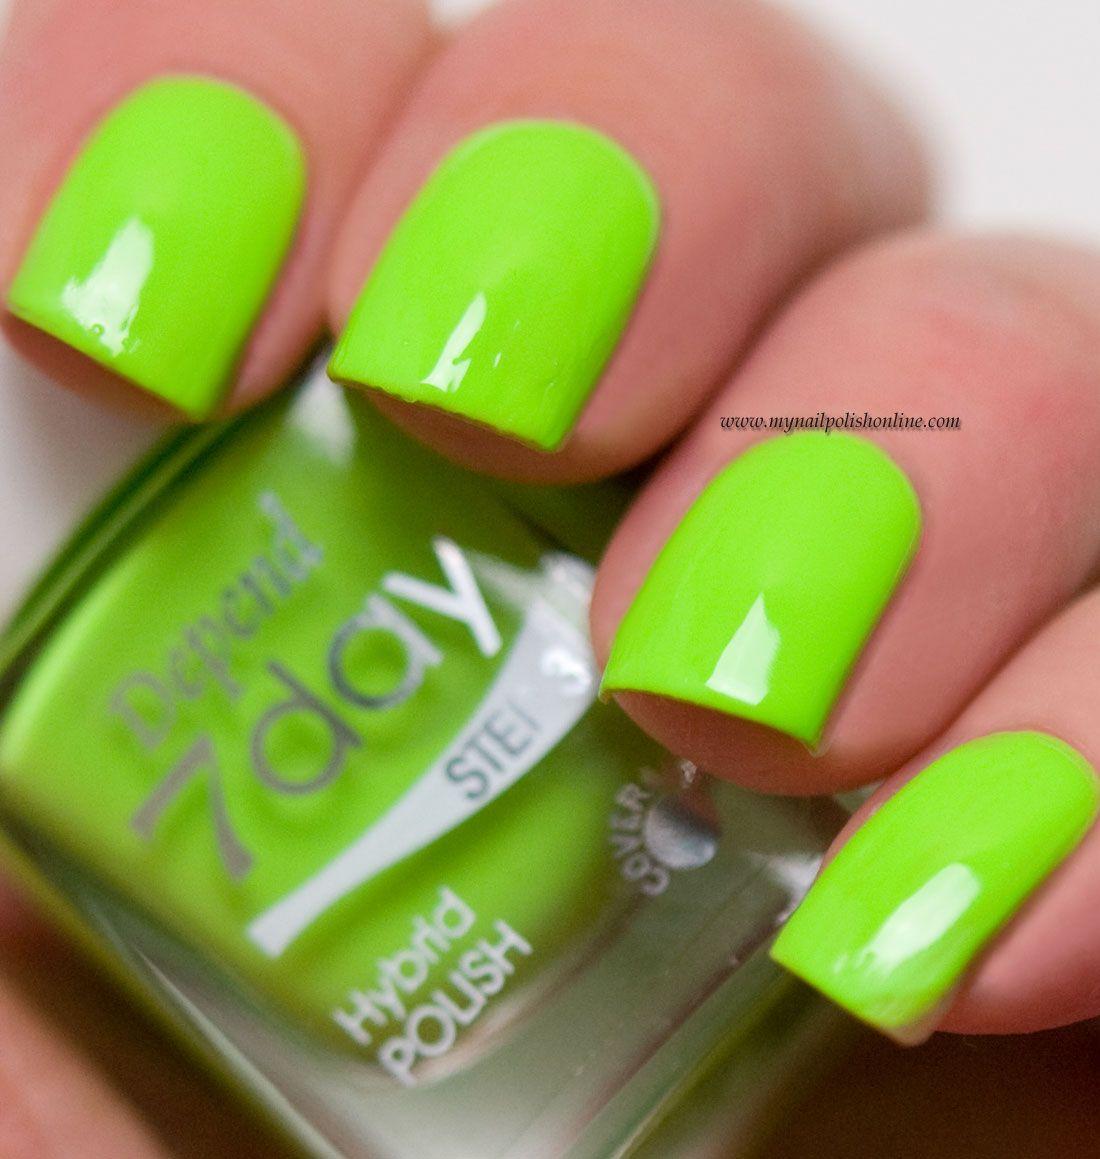 Depend - Knock Out Neon | Neon, Nail polish online and Nail polish art